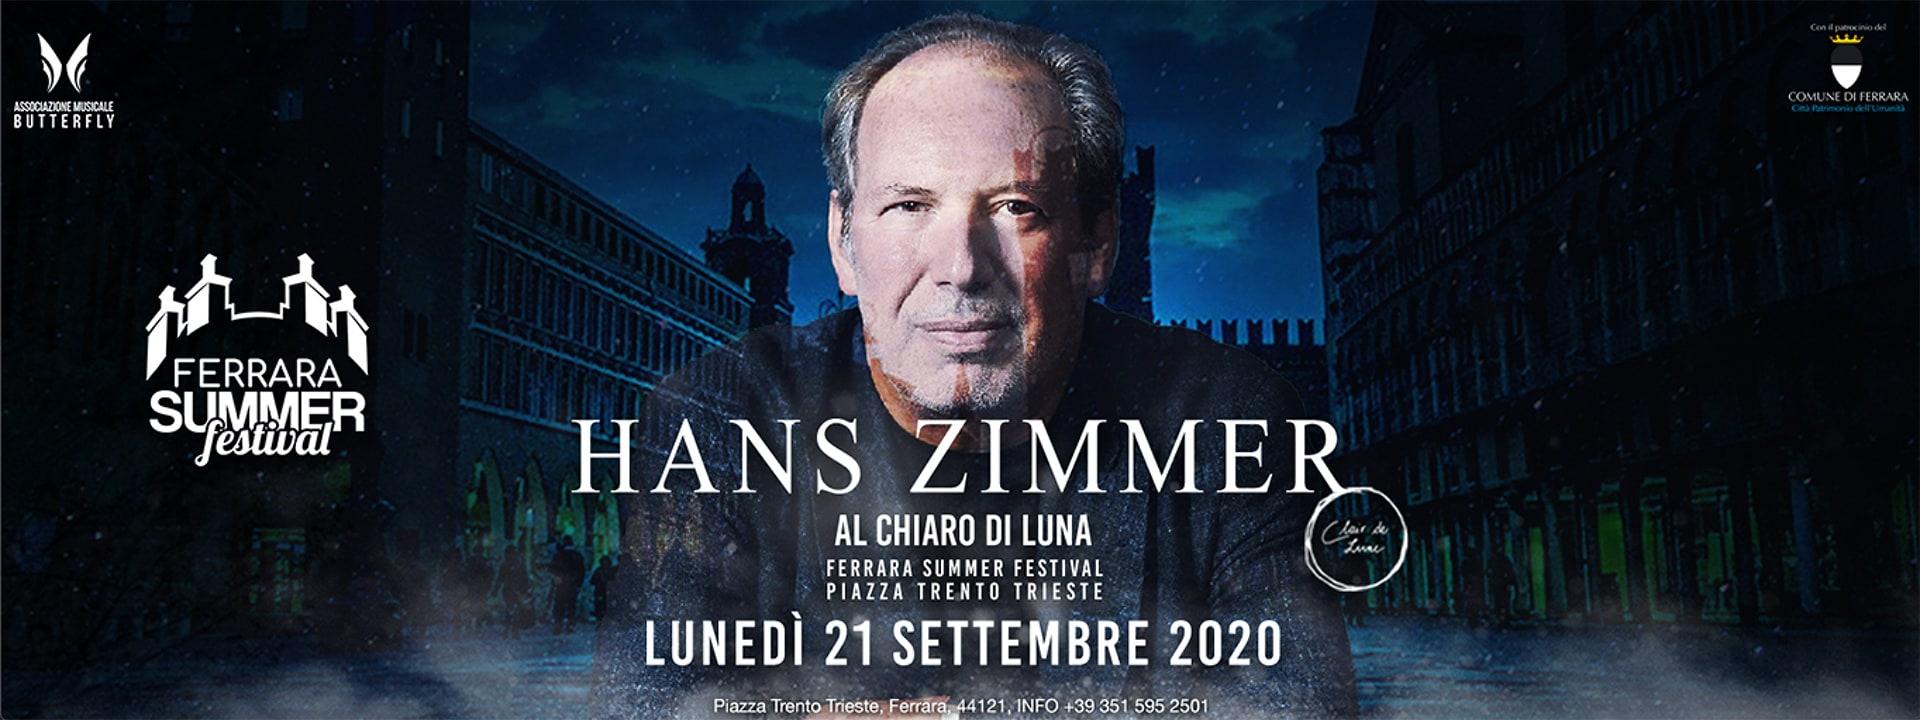 HANS ZIMMER Tributo Lunare – Lunedì 21 Settembre 2020